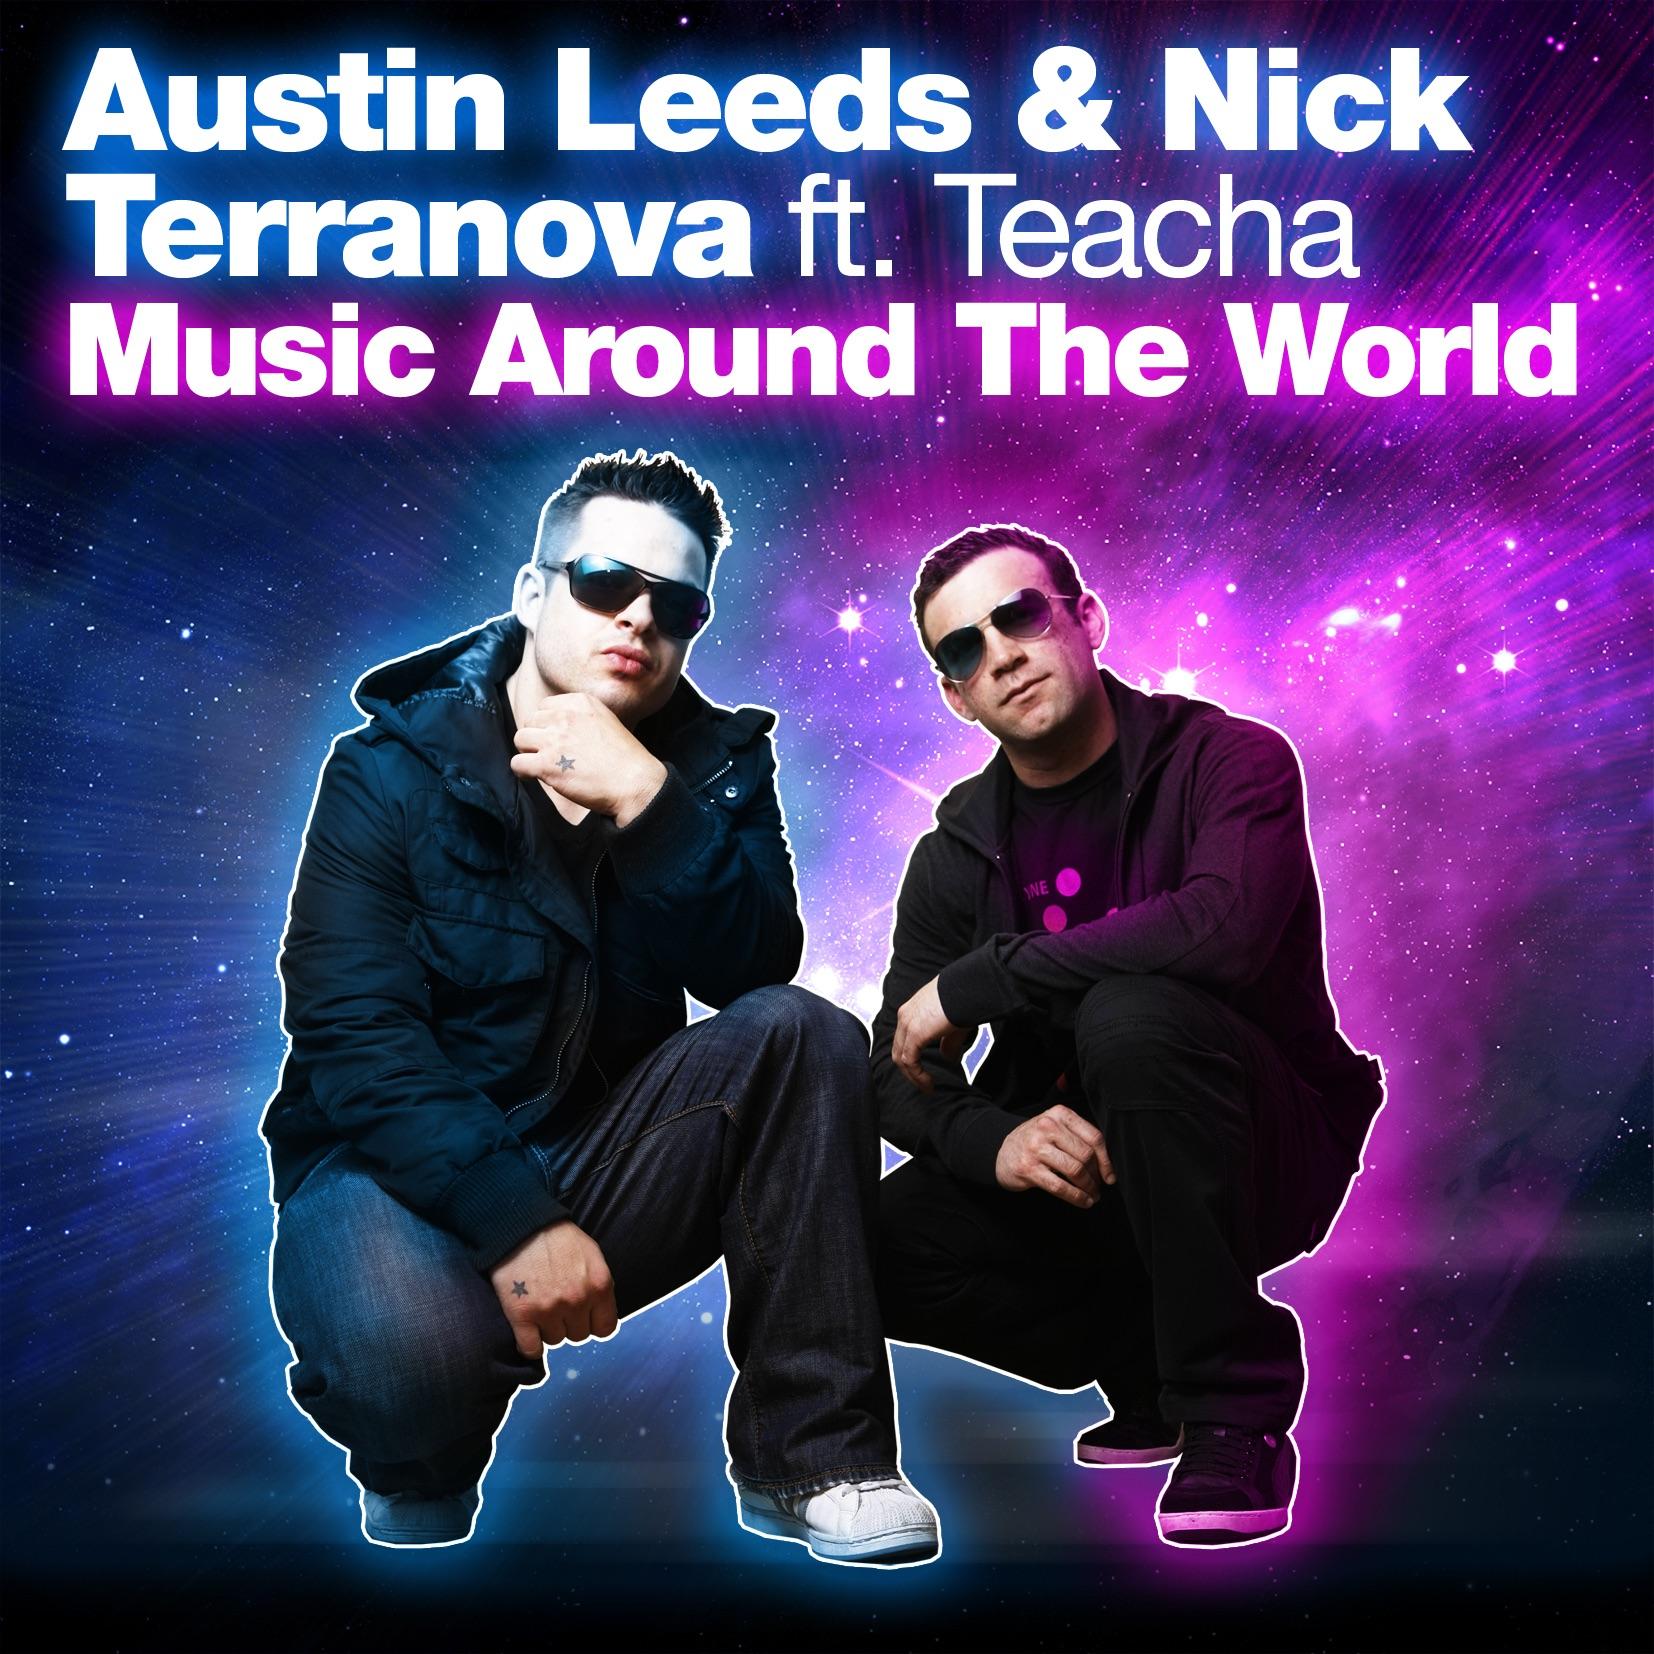 Music Around the World (feat. Teacha) - EP